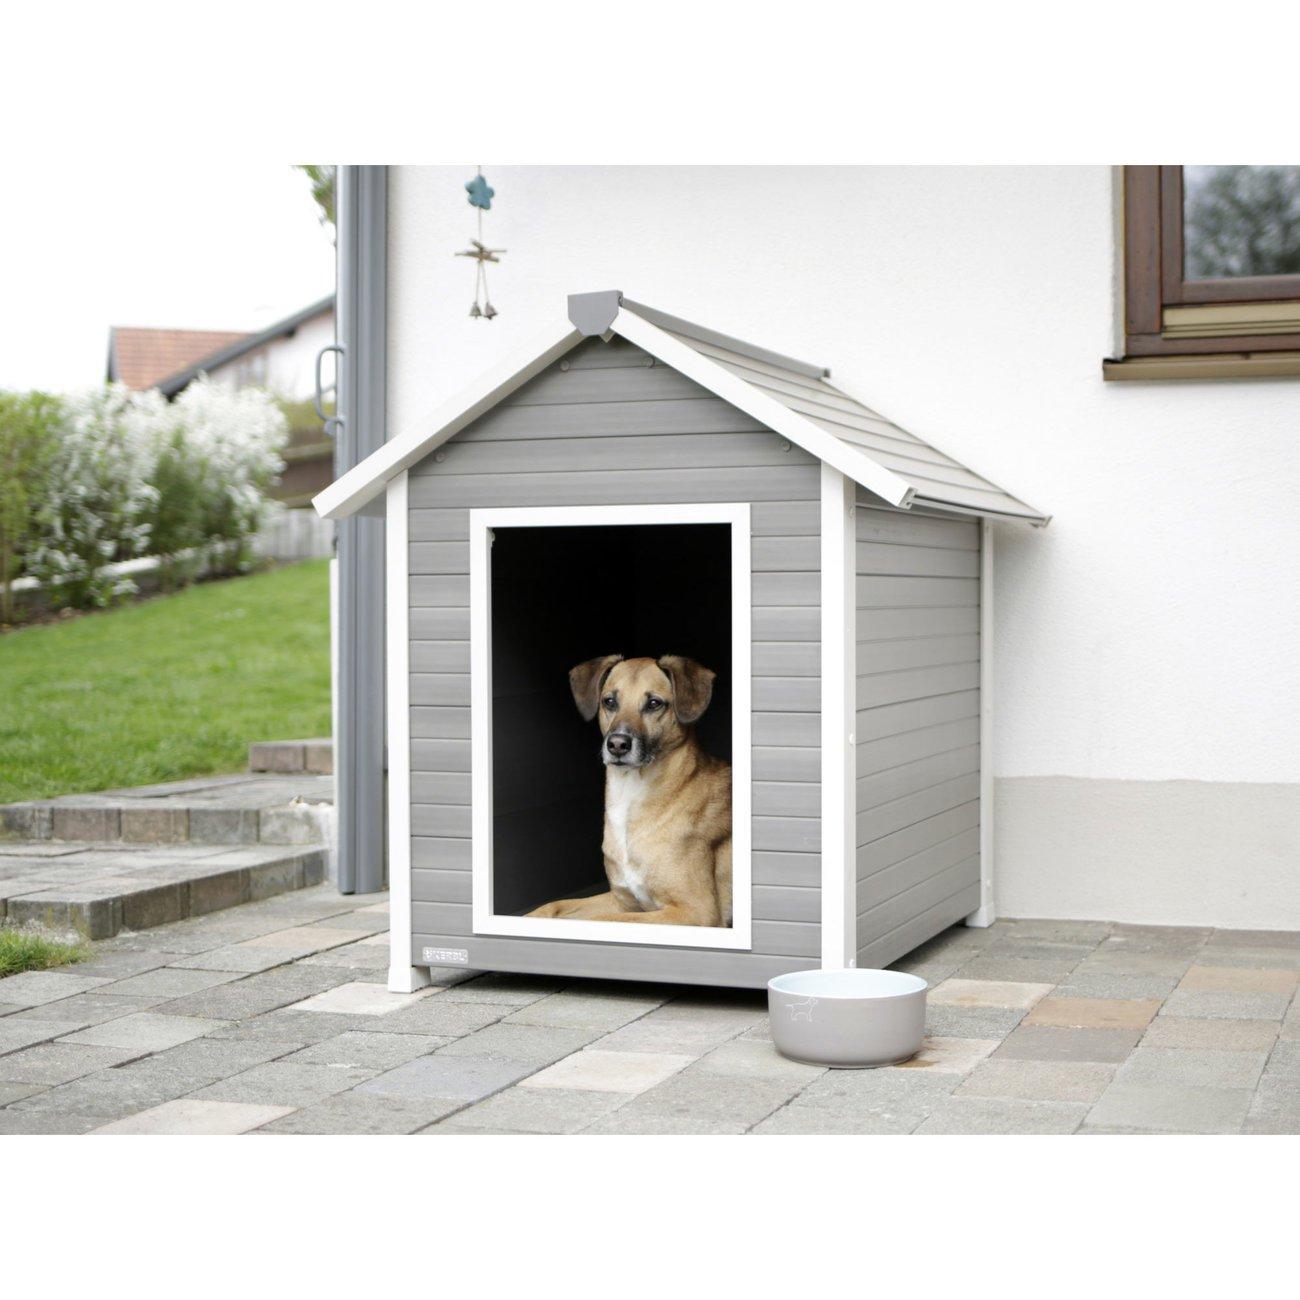 Kerbl Eco-Hundehütte Hendry, Bild 8